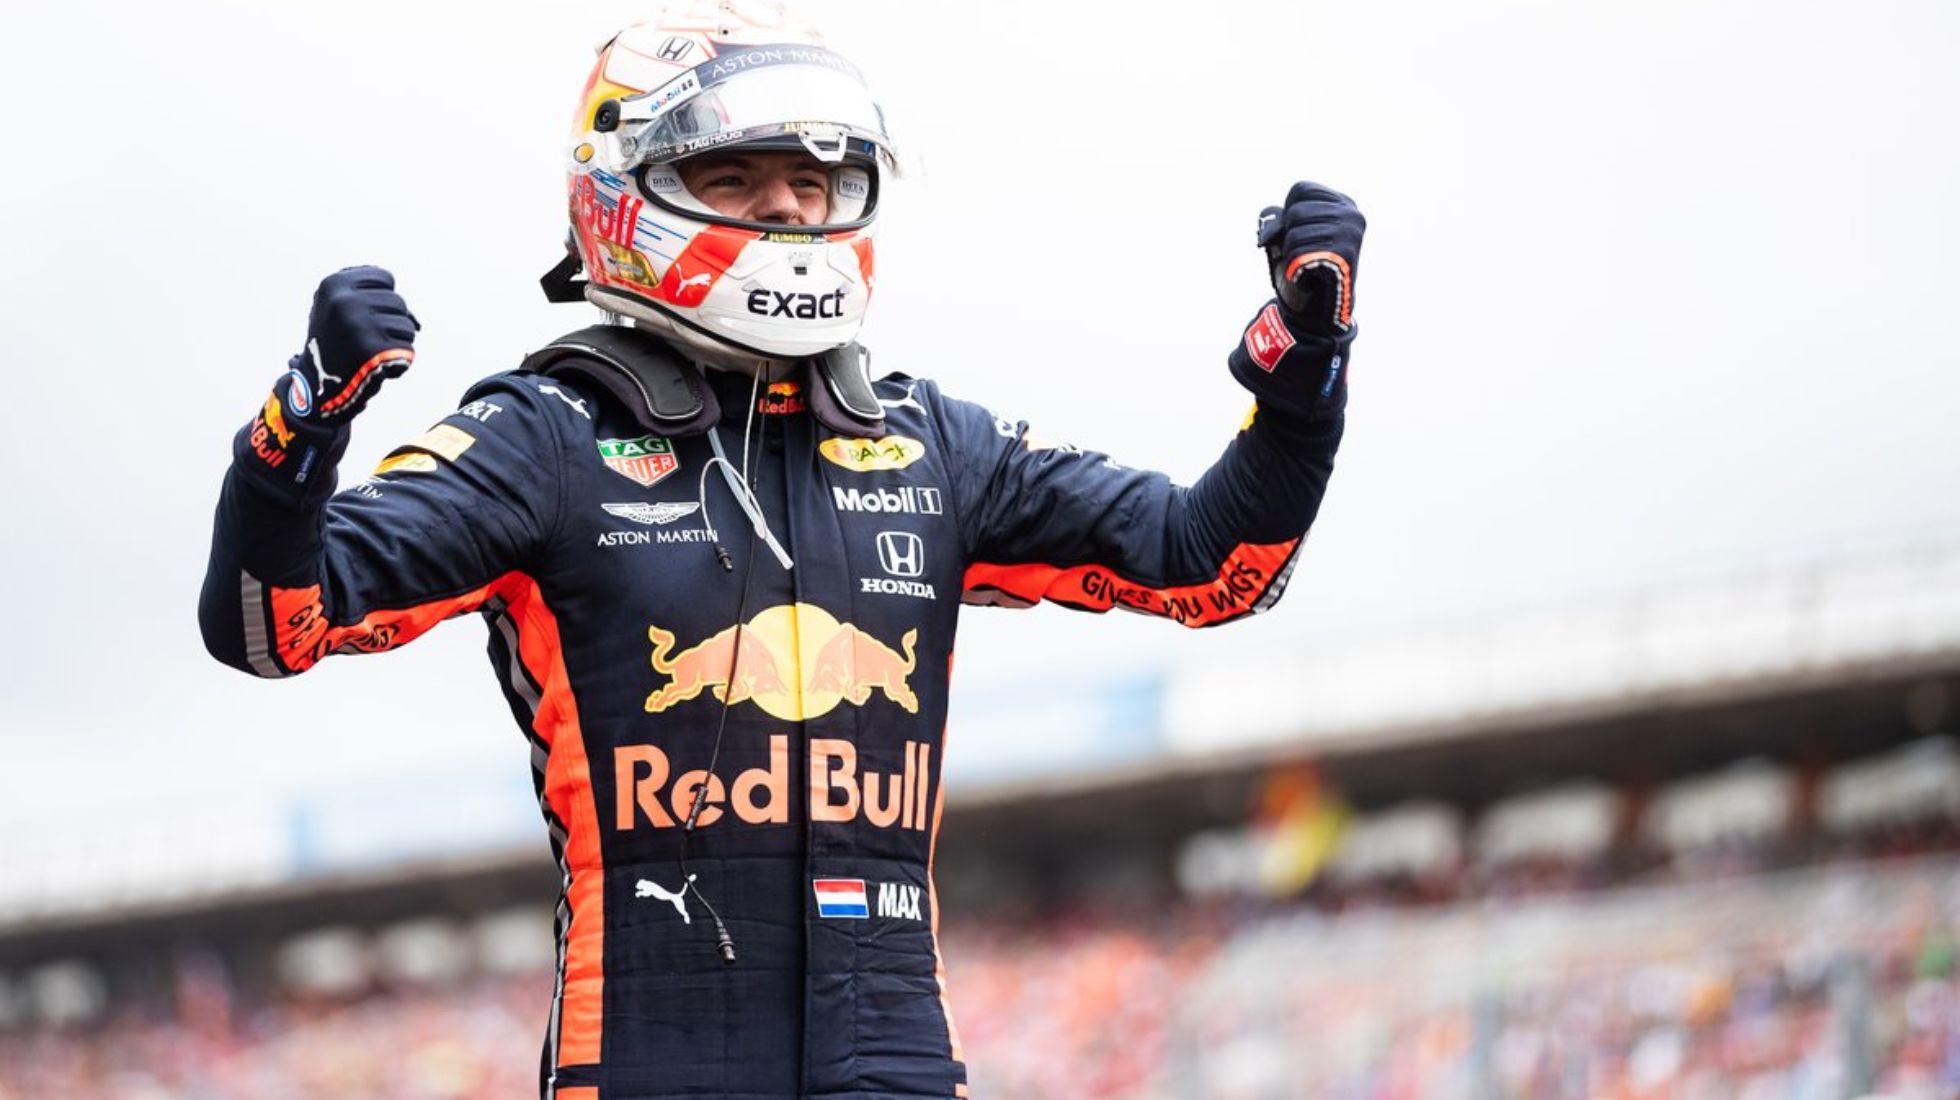 Max Verstappen opens his win tally in a damage & debris-strewn Imola race